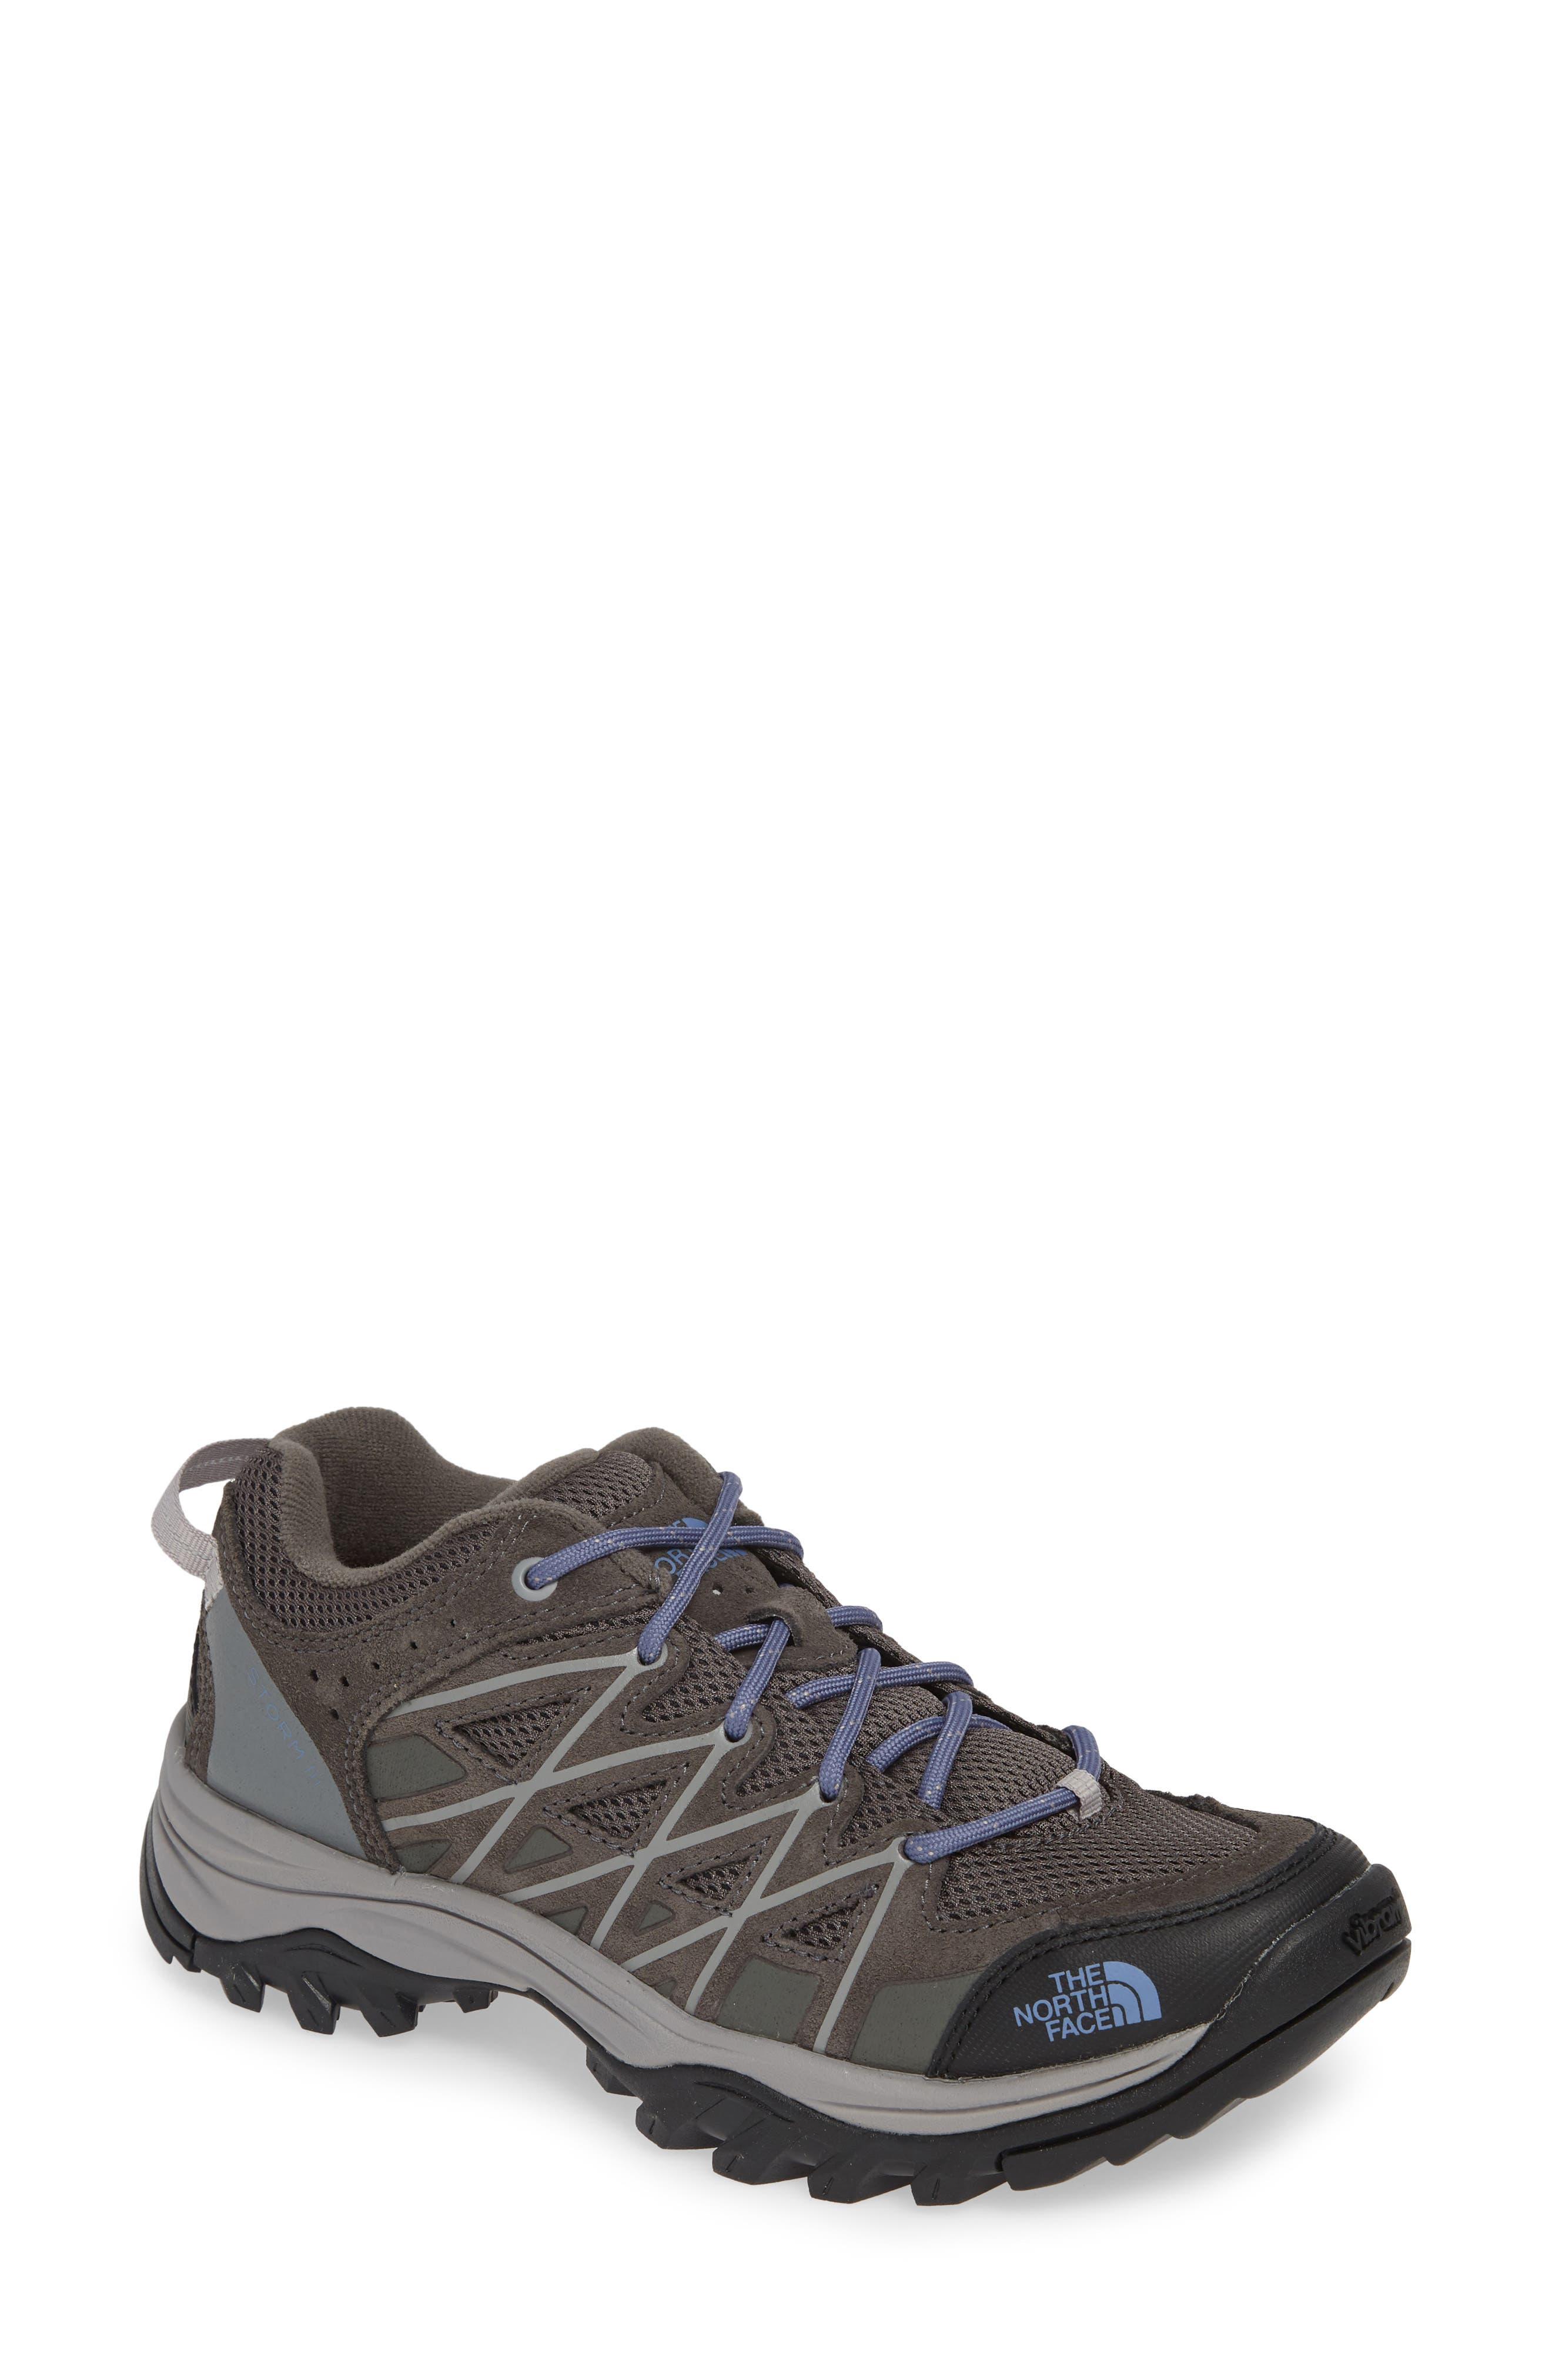 The North Face Storm Iii Waterproof Hiking Sneaker- Grey d7b6572b00f